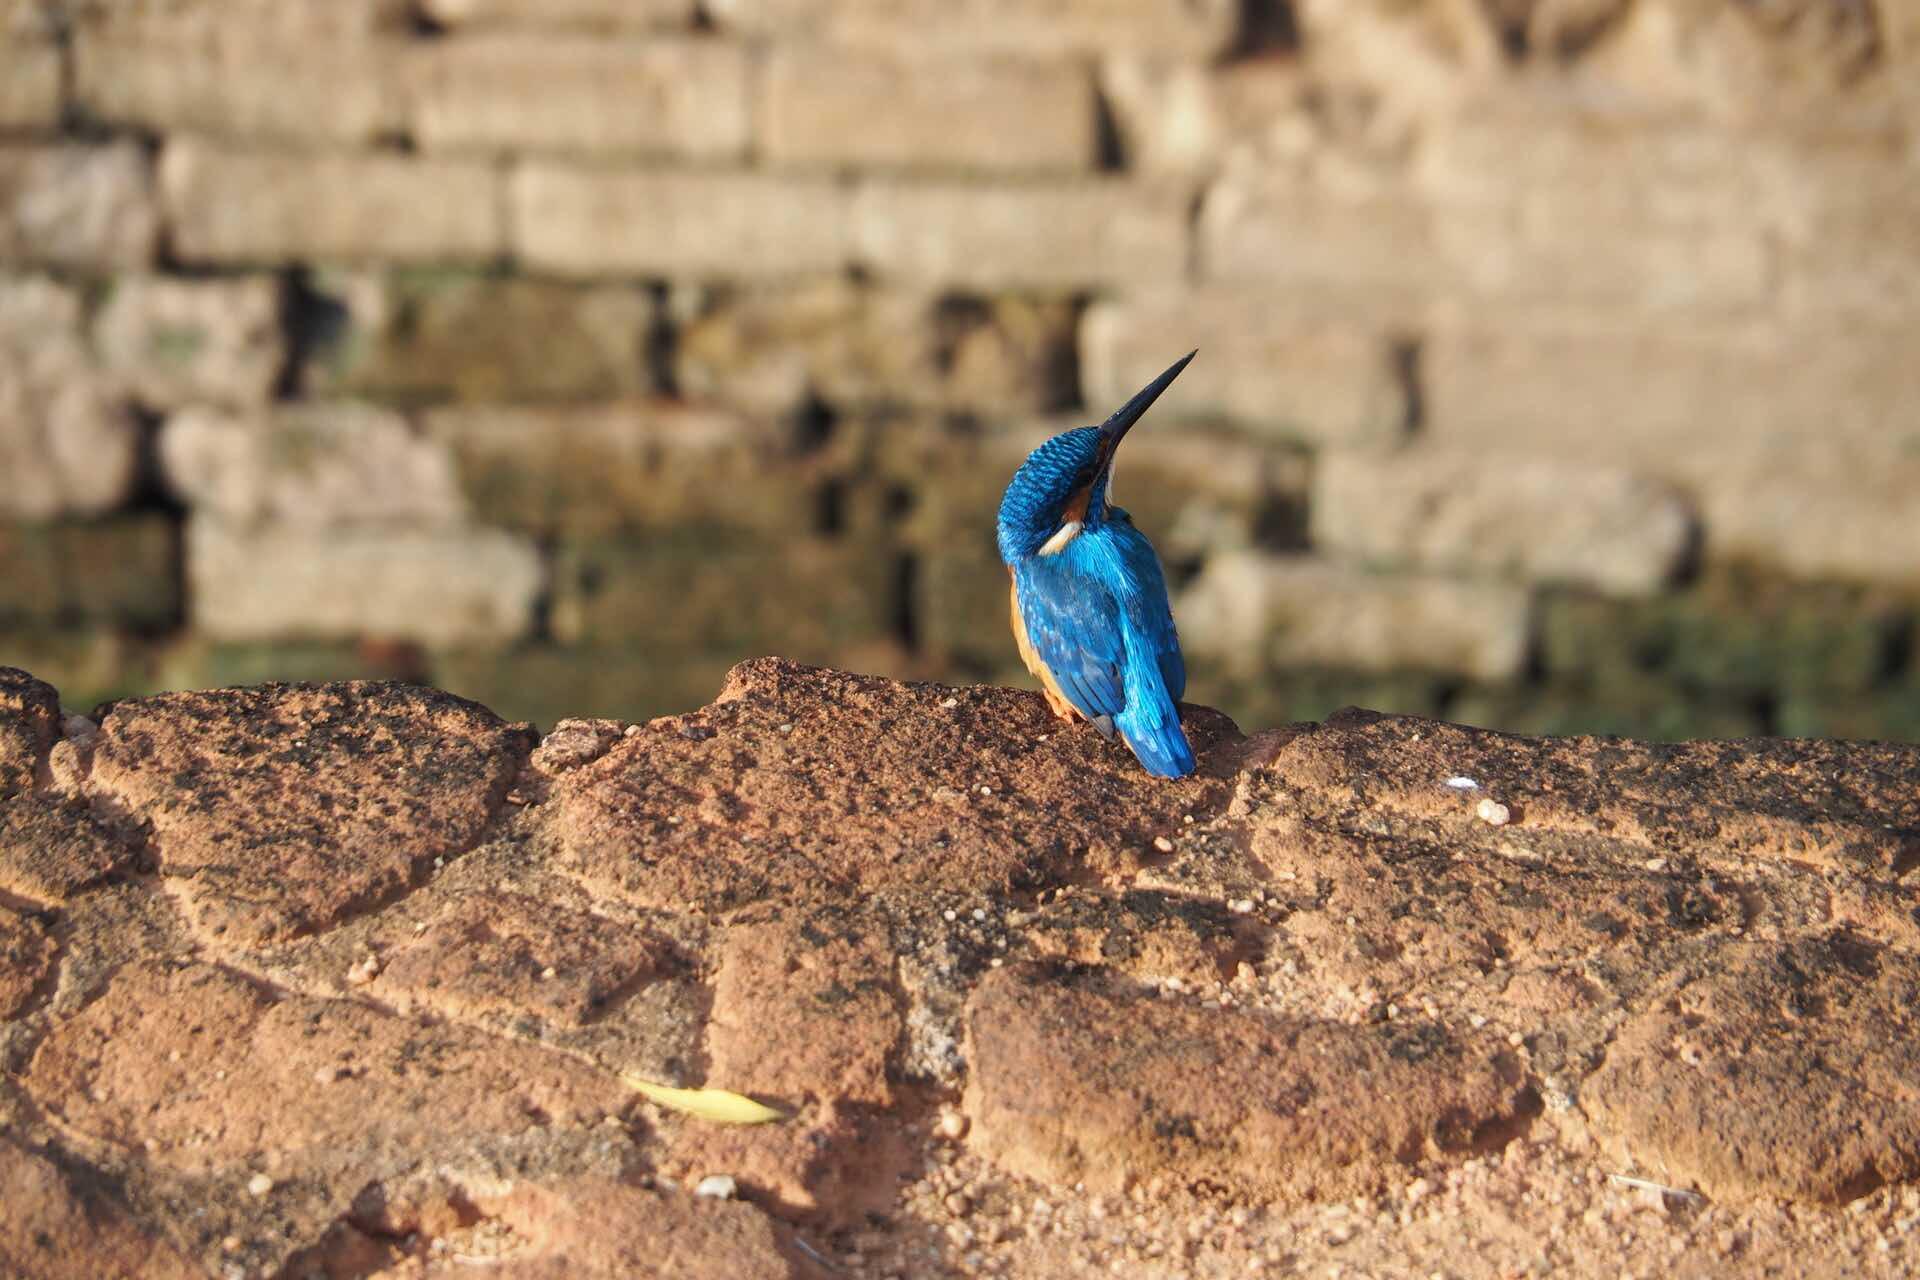 sri-lanka-kingfisher-bird-holiday-review-feedback-invite-to-paradise-quentin-kate-hulm.jpg